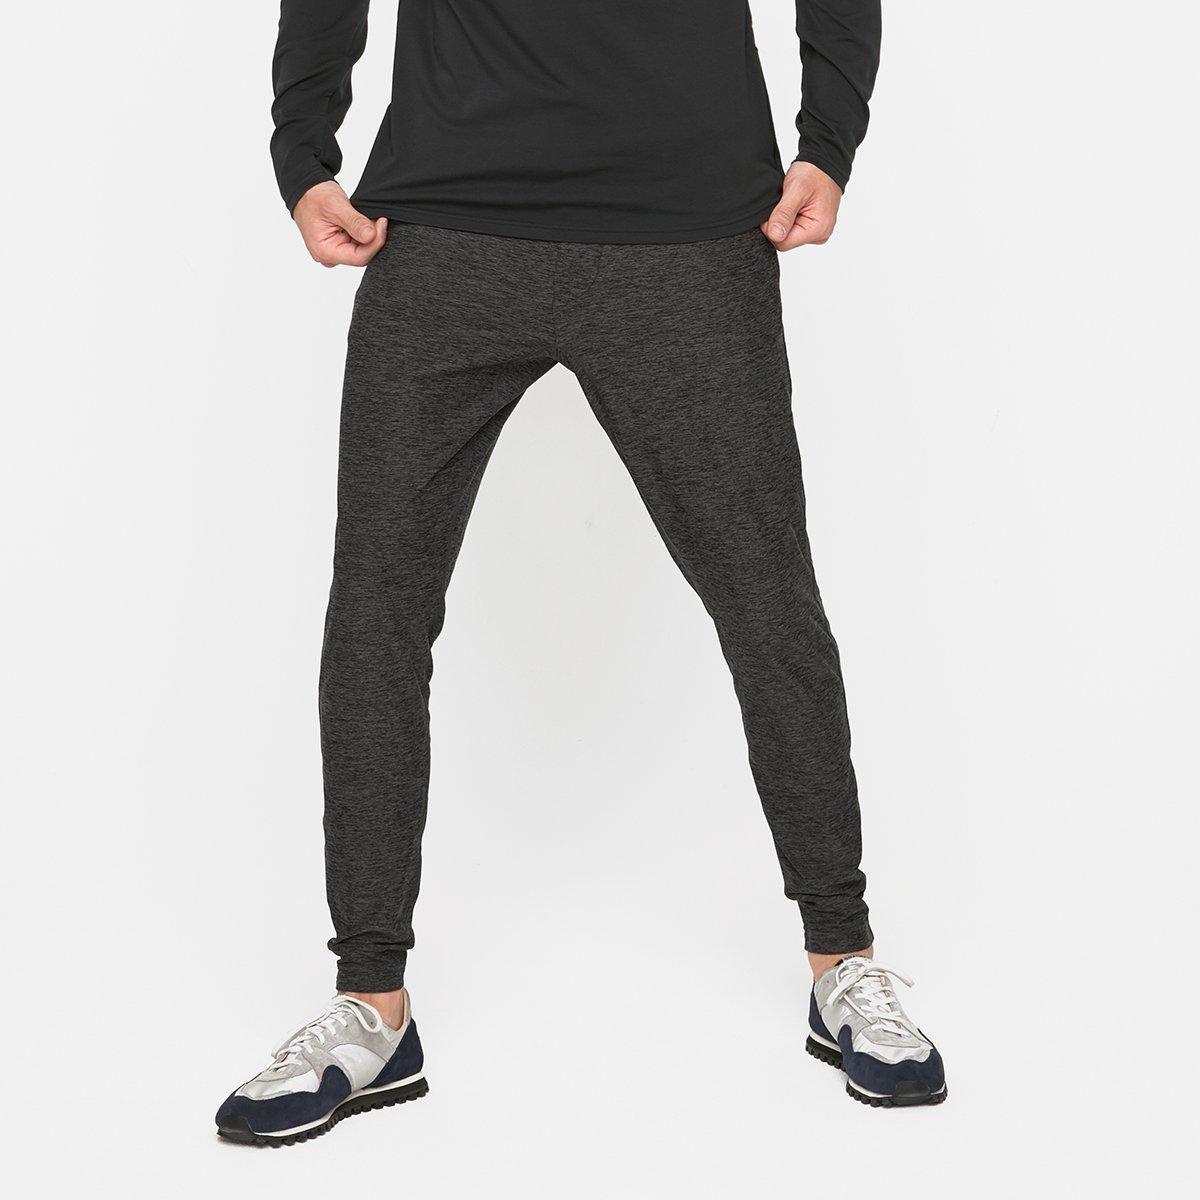 Pantalones deportivos Cloudknit